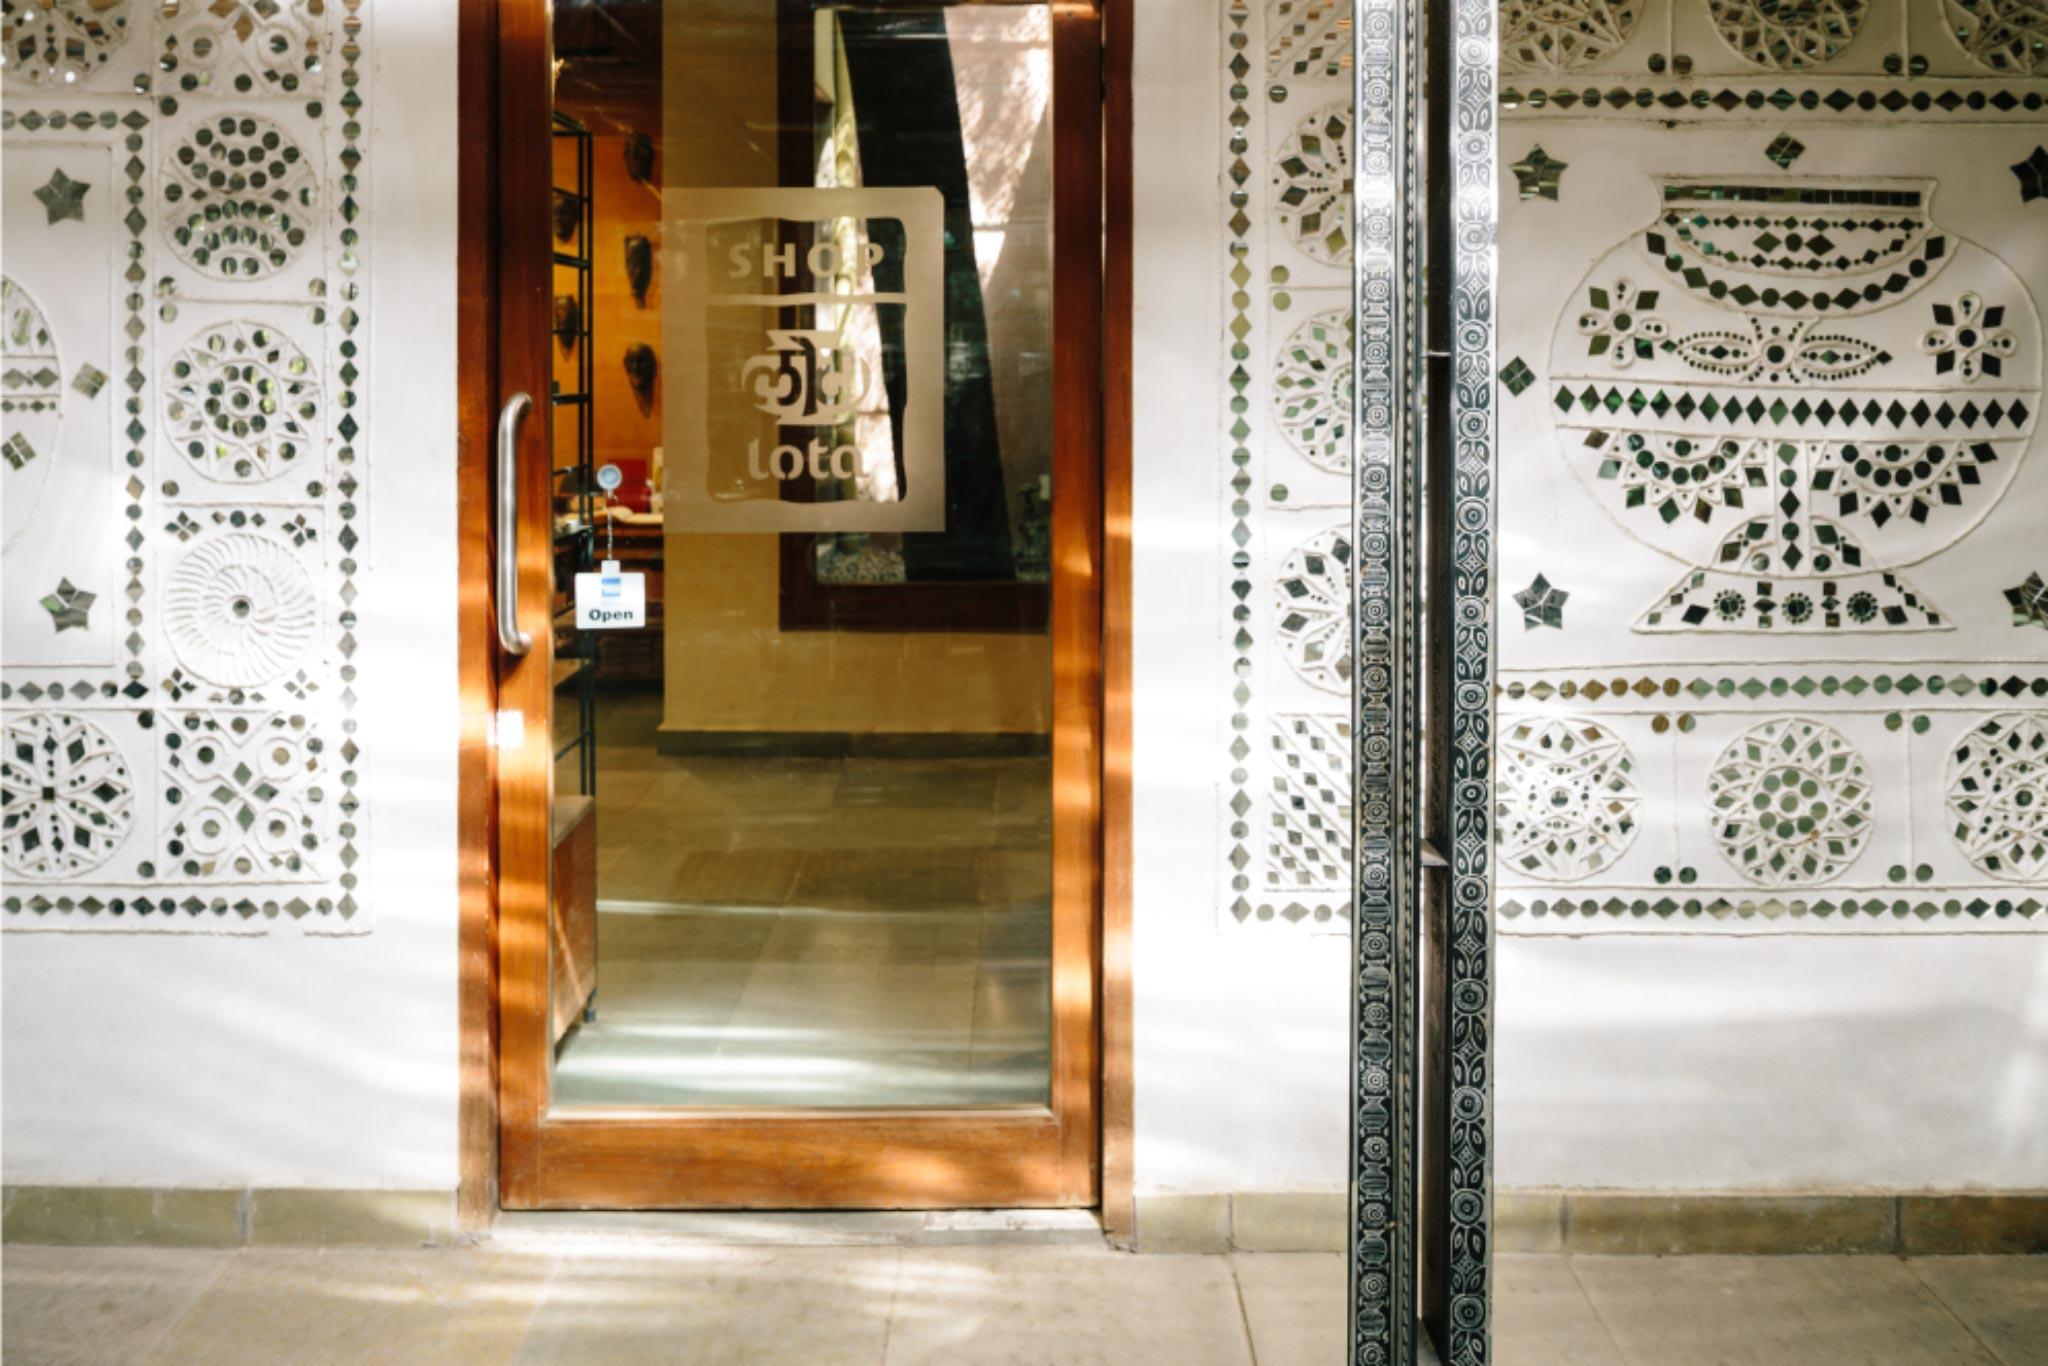 Cafe Lota & Museum Shop Delhi